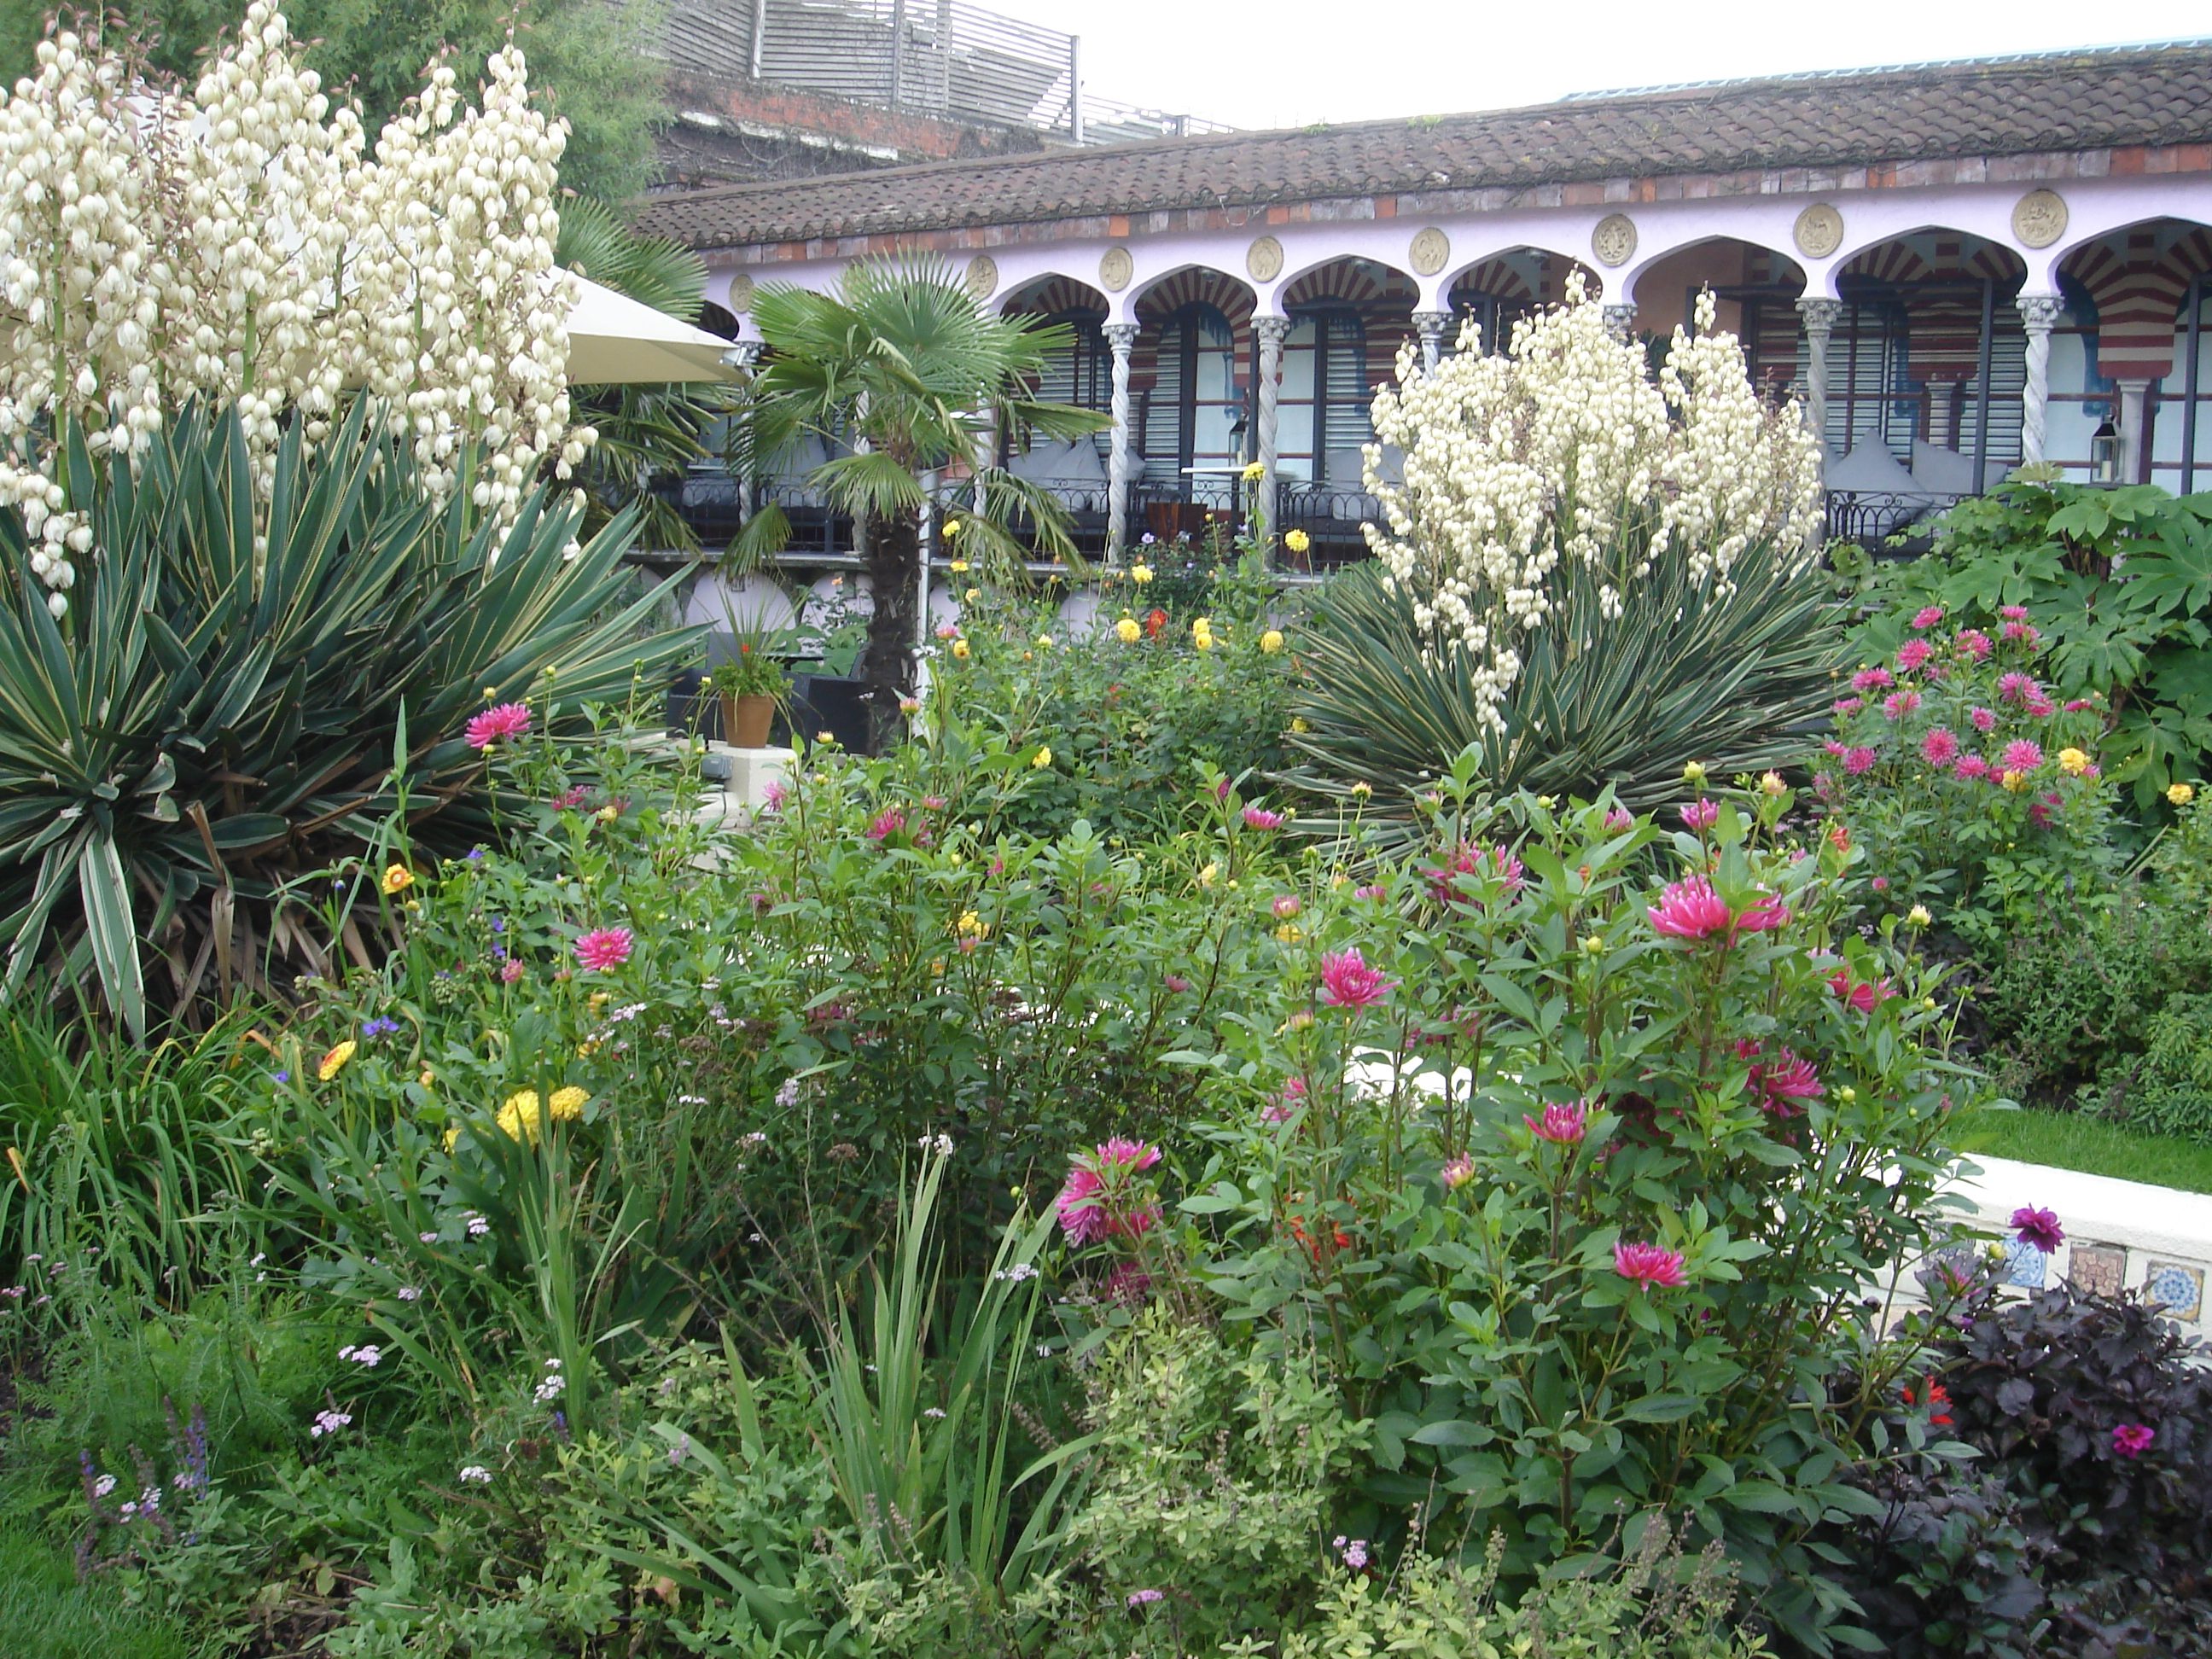 Kensington Roof Gardens - Wikipedia